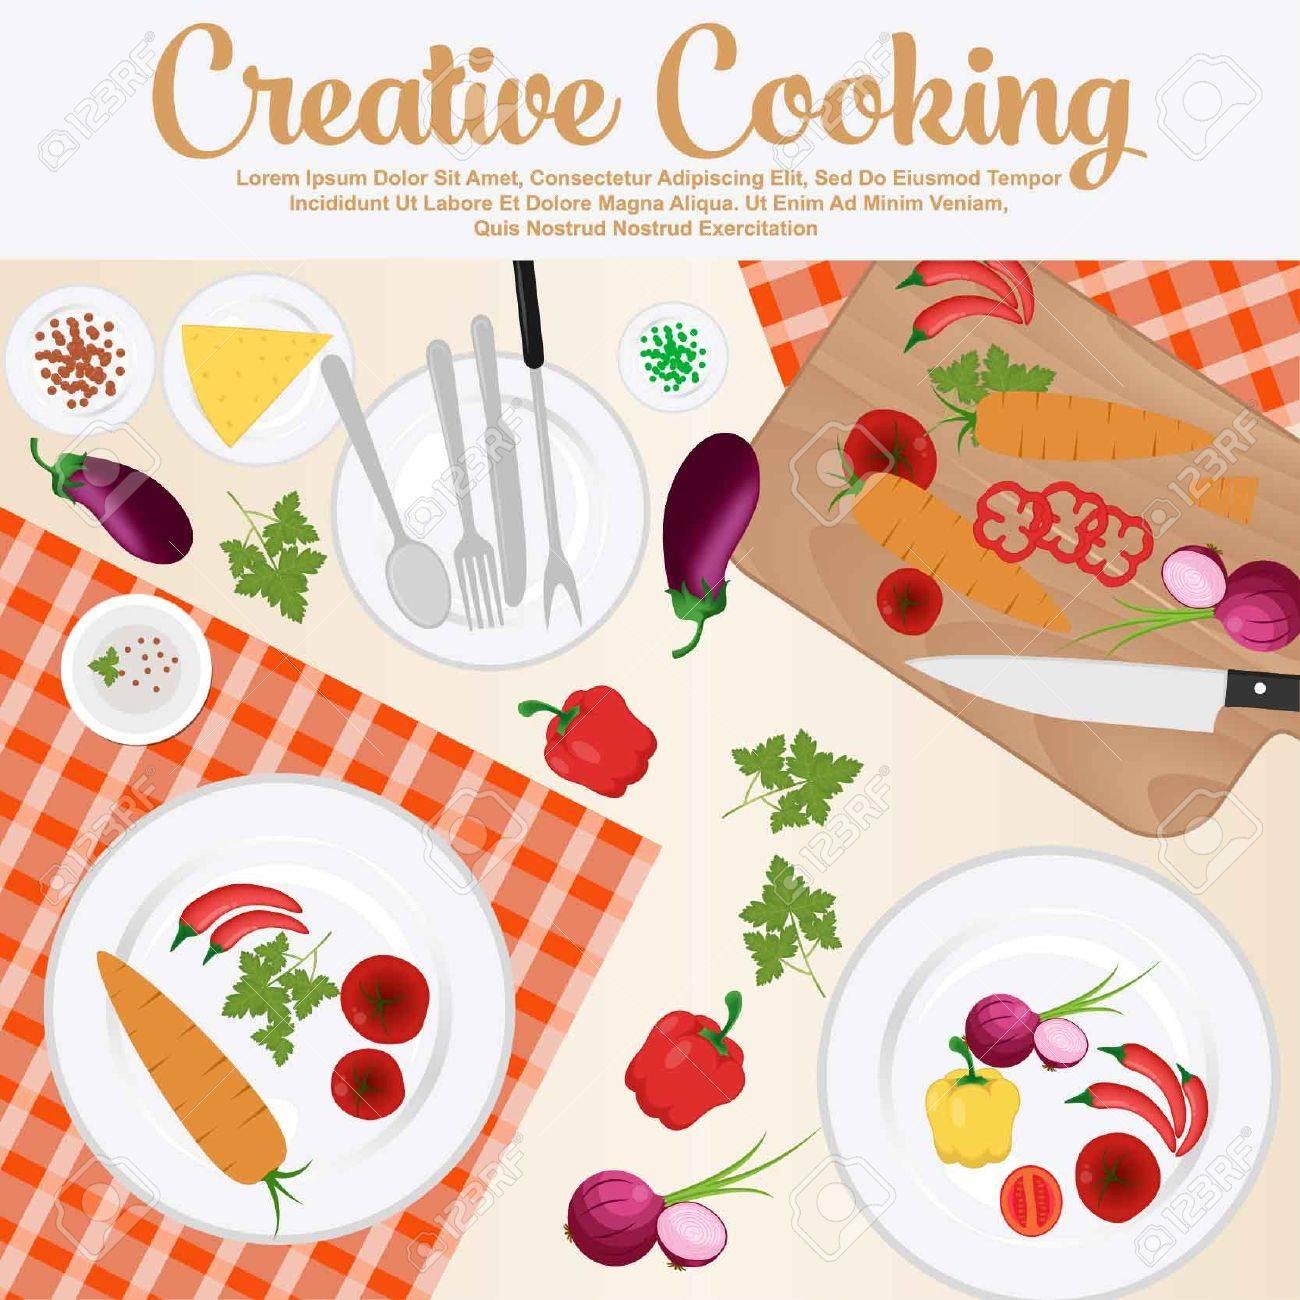 Perfecto Cocina Creativa Diseña Burscough Colección de Imágenes ...